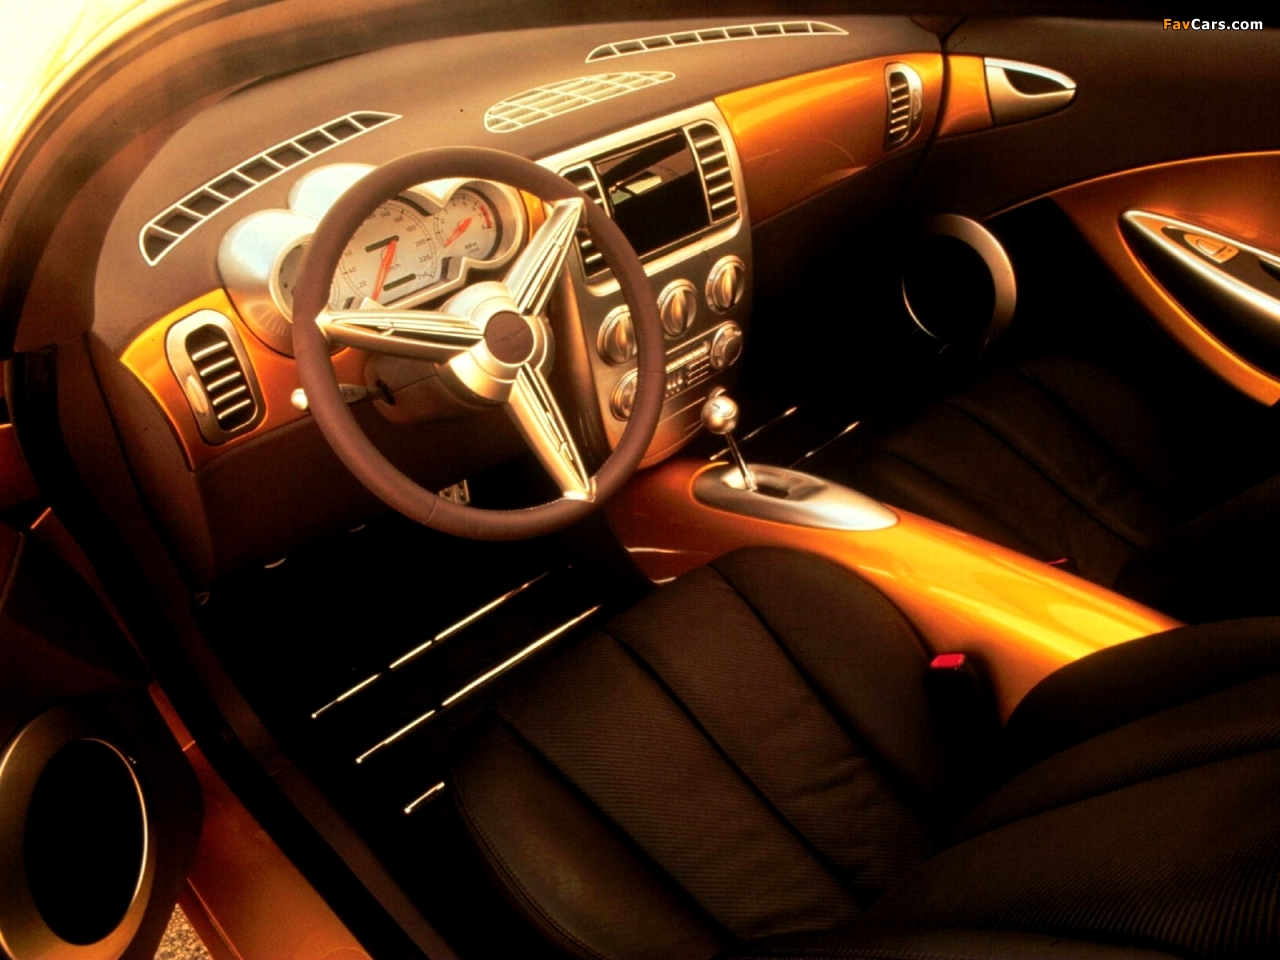 Chrysler Pronto Cruizer Concept 1999 images (1280 x 960)